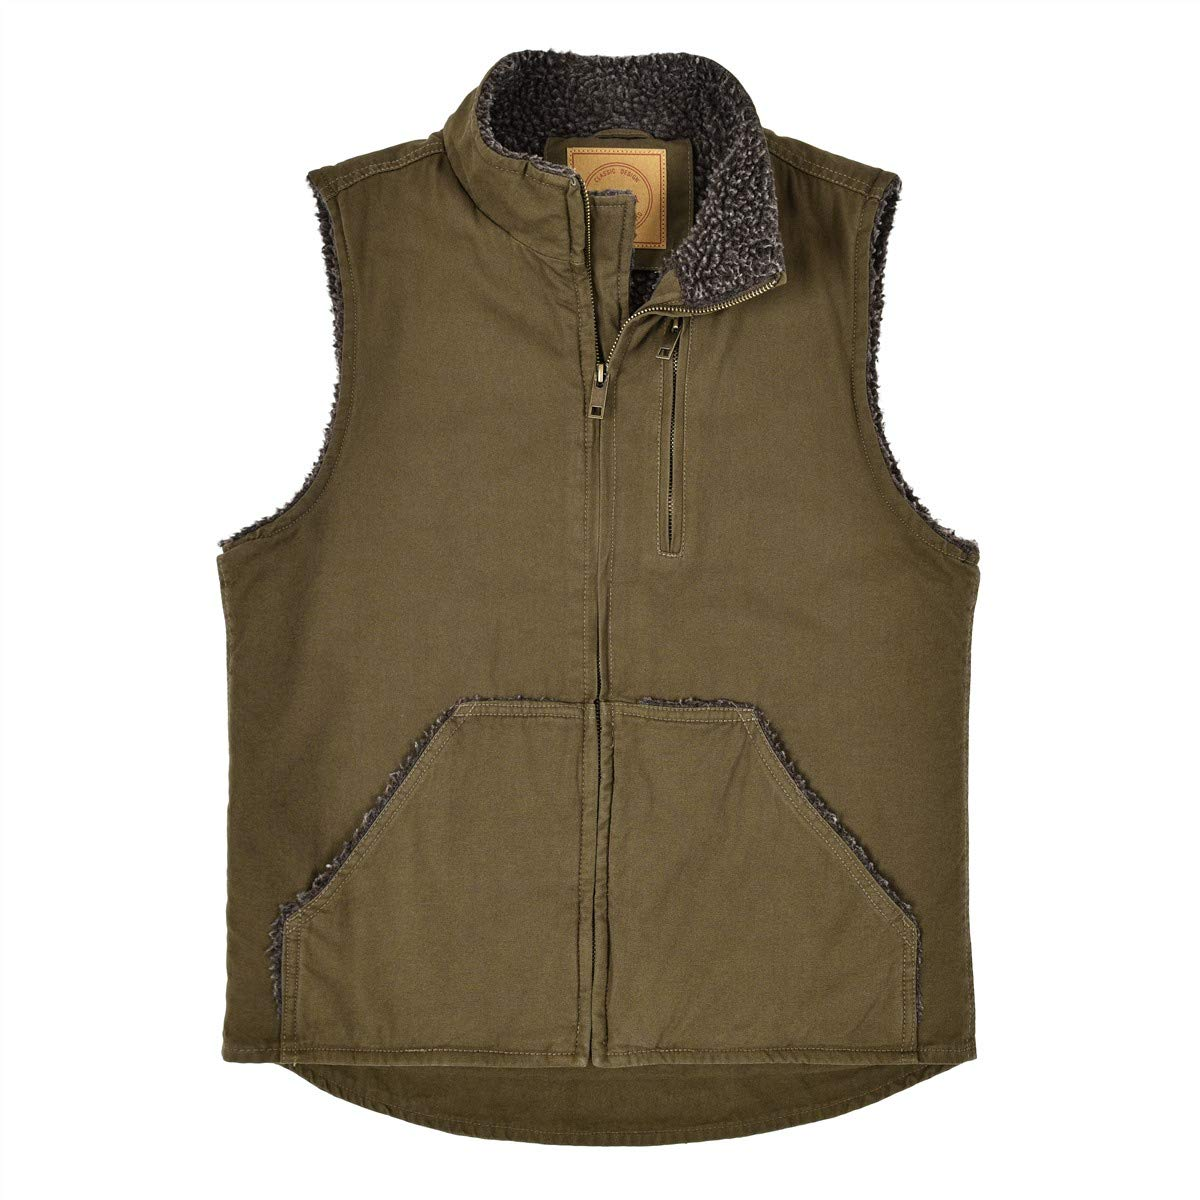 BOTVELA Men's Fleece Lined Vest Zip-up Casual Winter Warm Outwear Sleeveless Jacket (Brown, Large) by BOTVELA